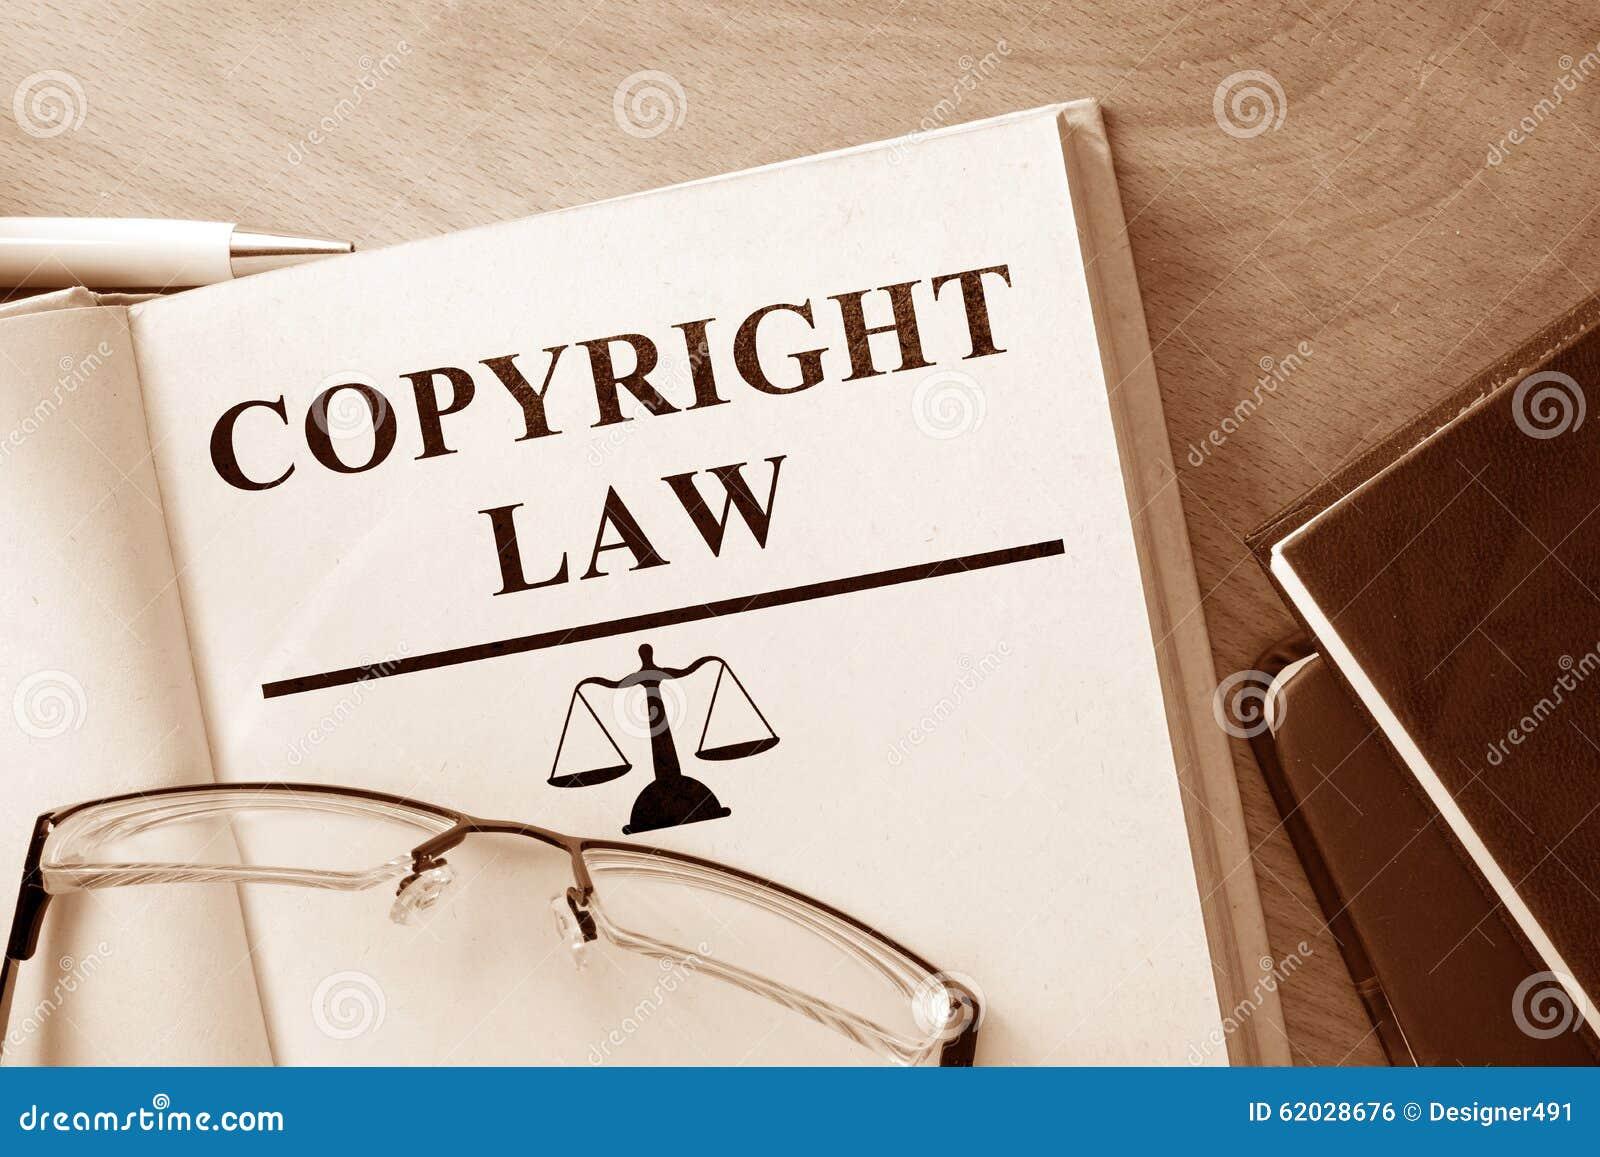 Legal origins theory